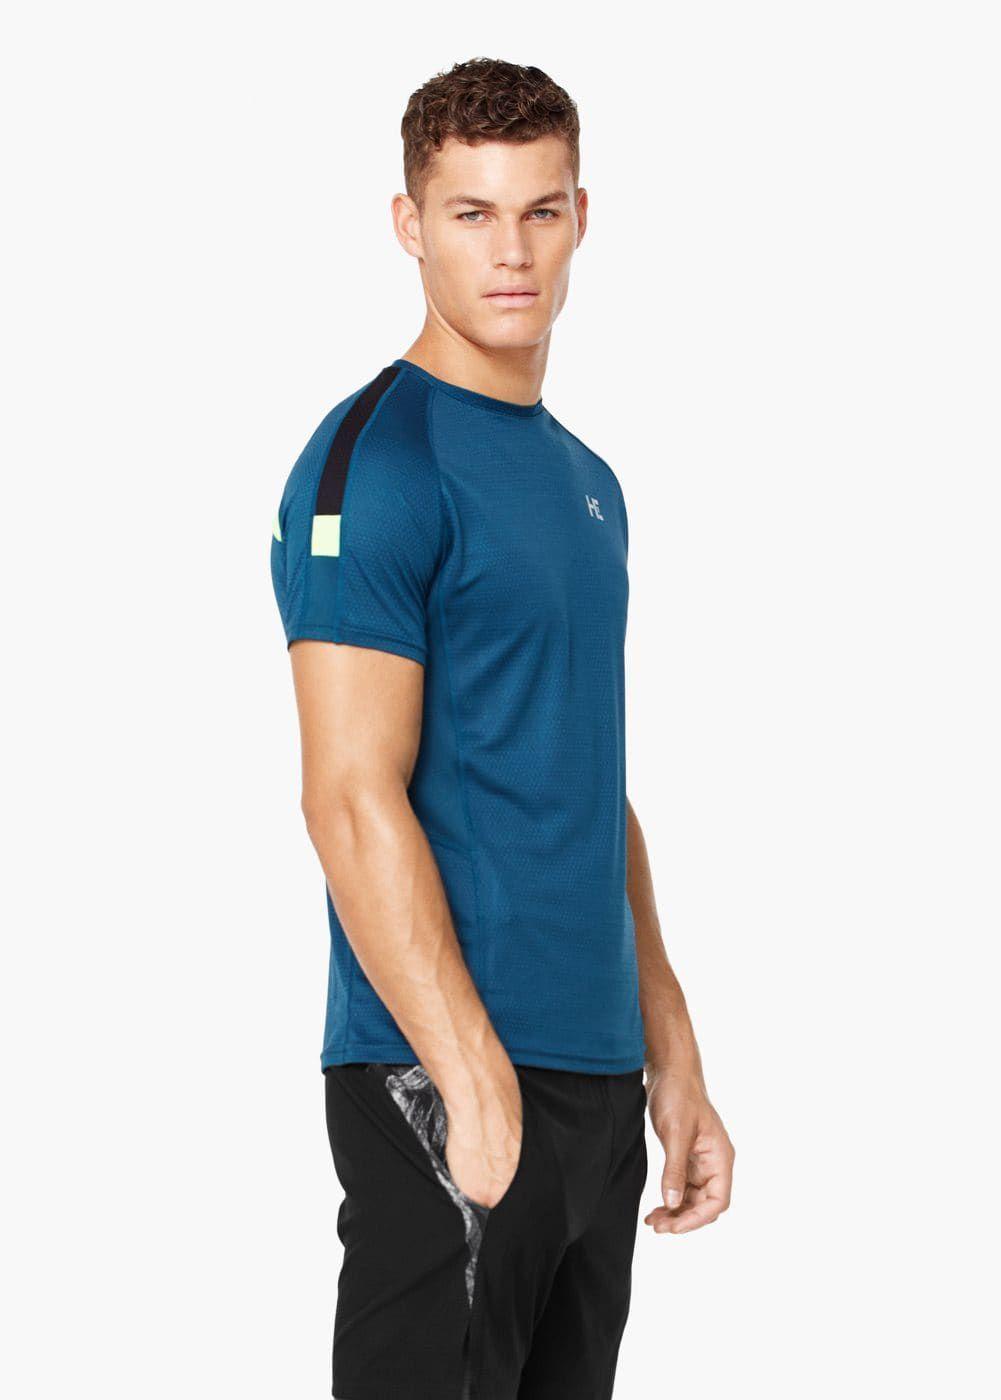 a5f77ebe6 Camiseta técnica manga corta running - Hombre